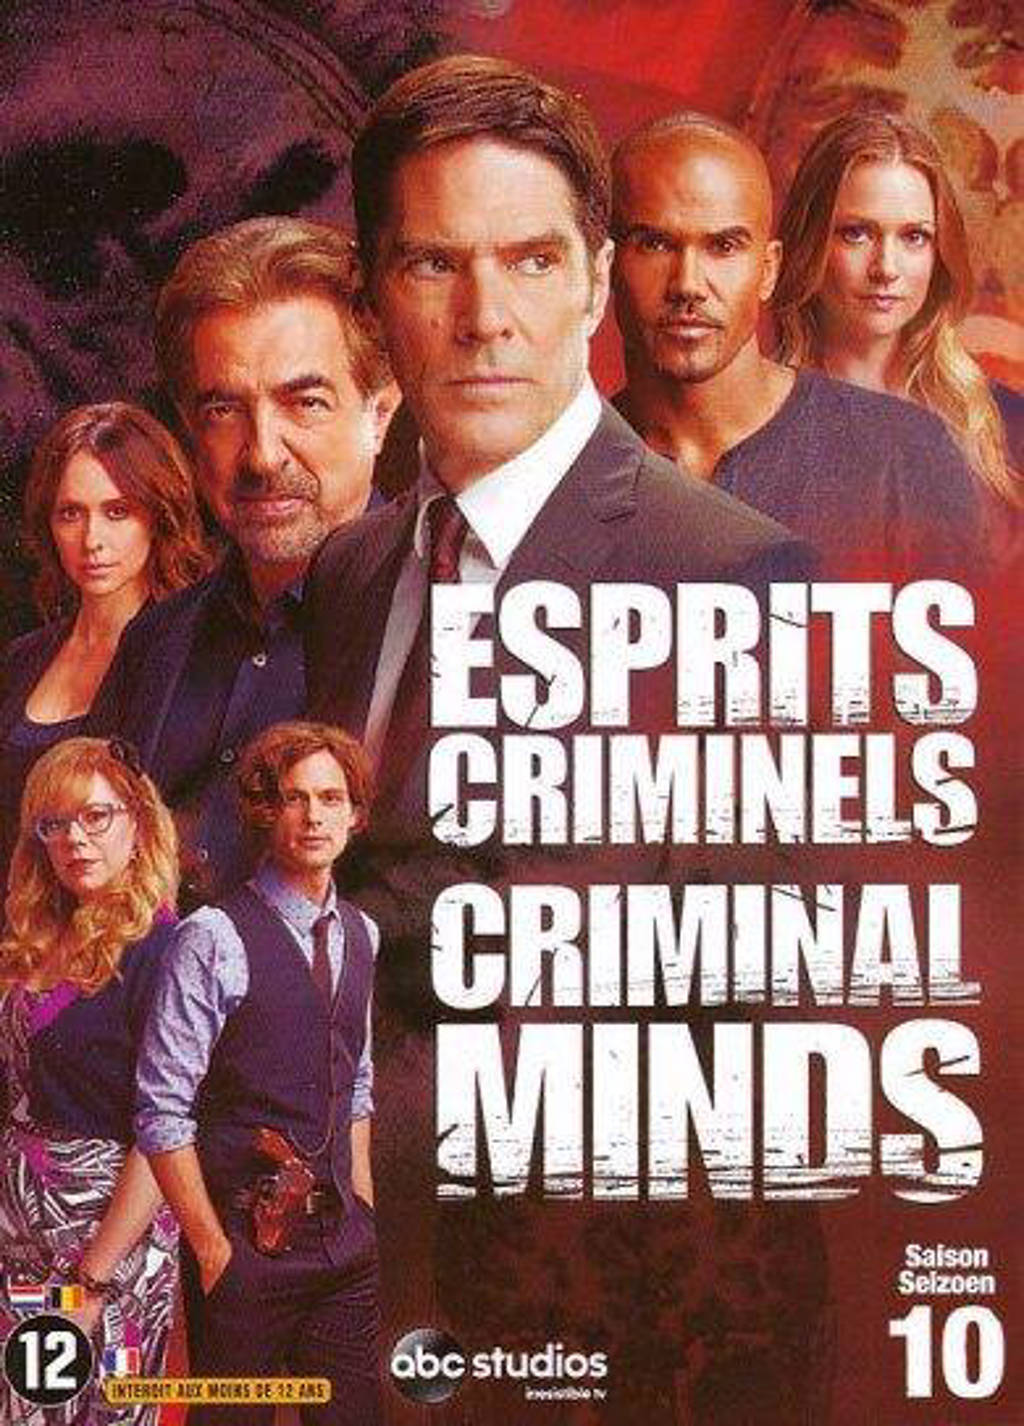 Criminal minds - Seizoen 10 (DVD)